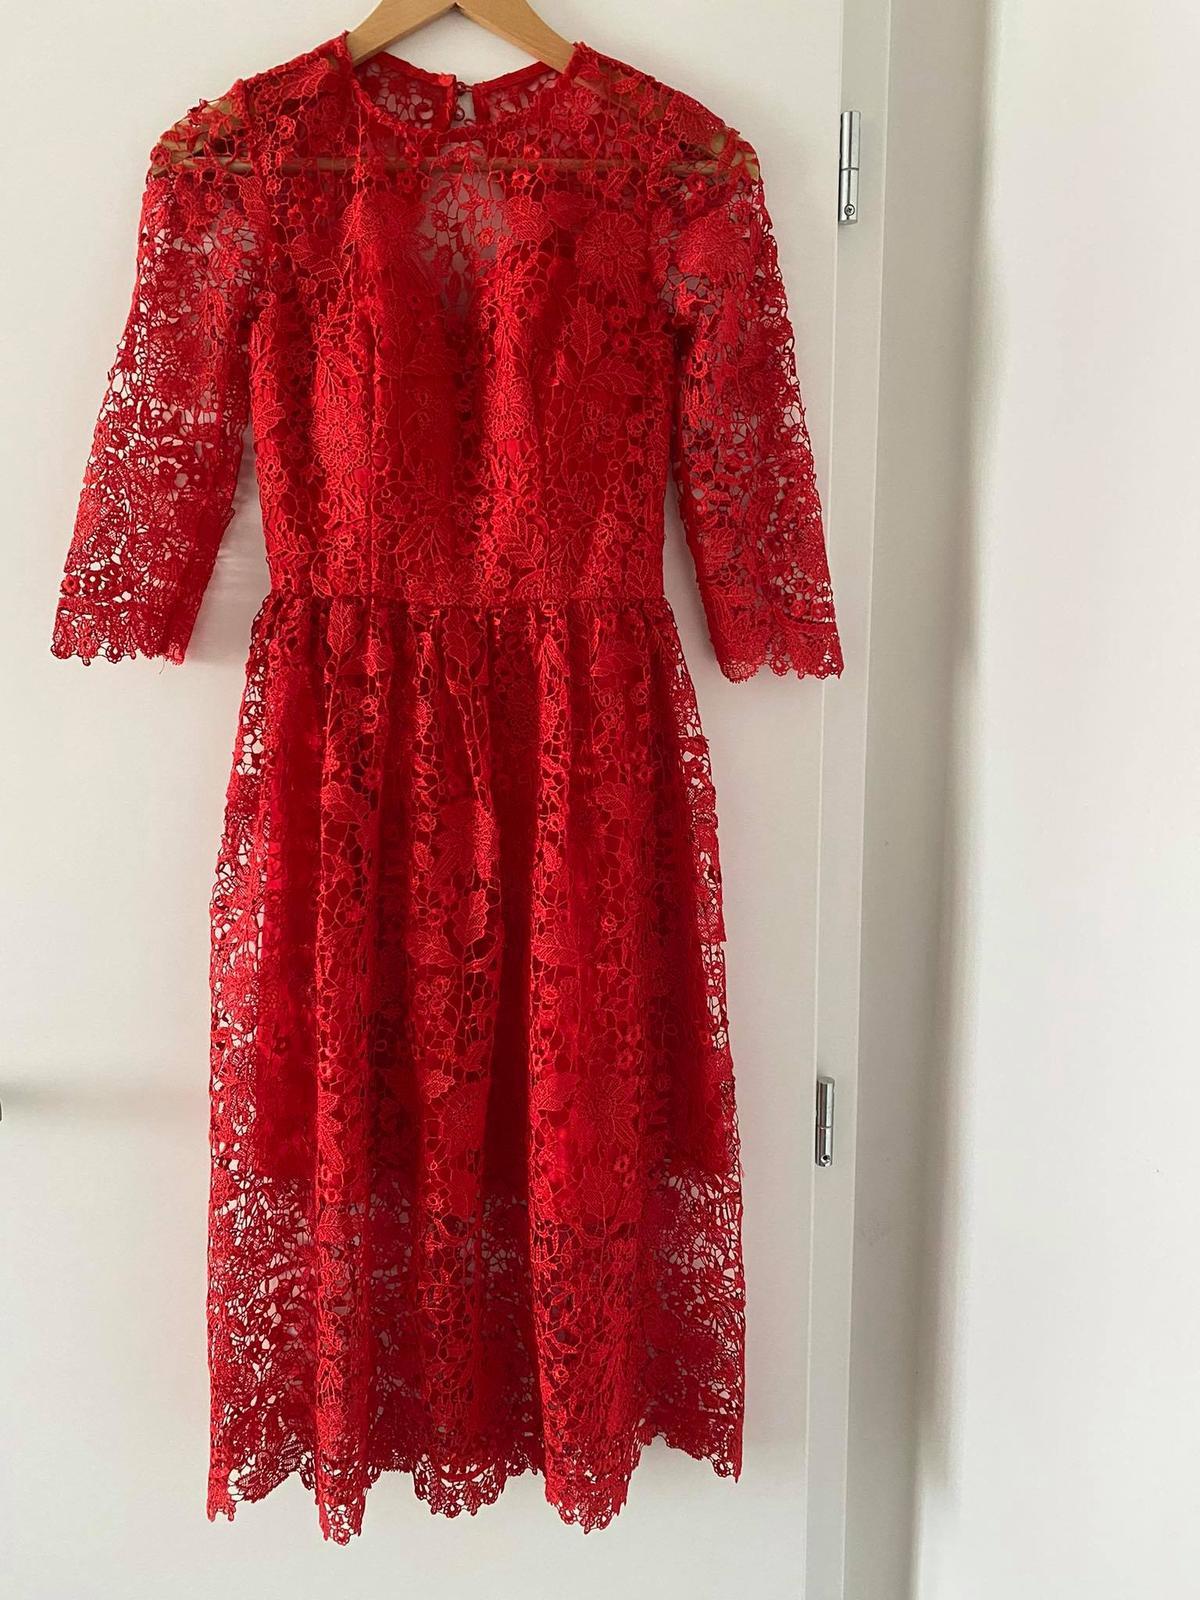 Spoločenské šaty červené - Obrázok č. 1